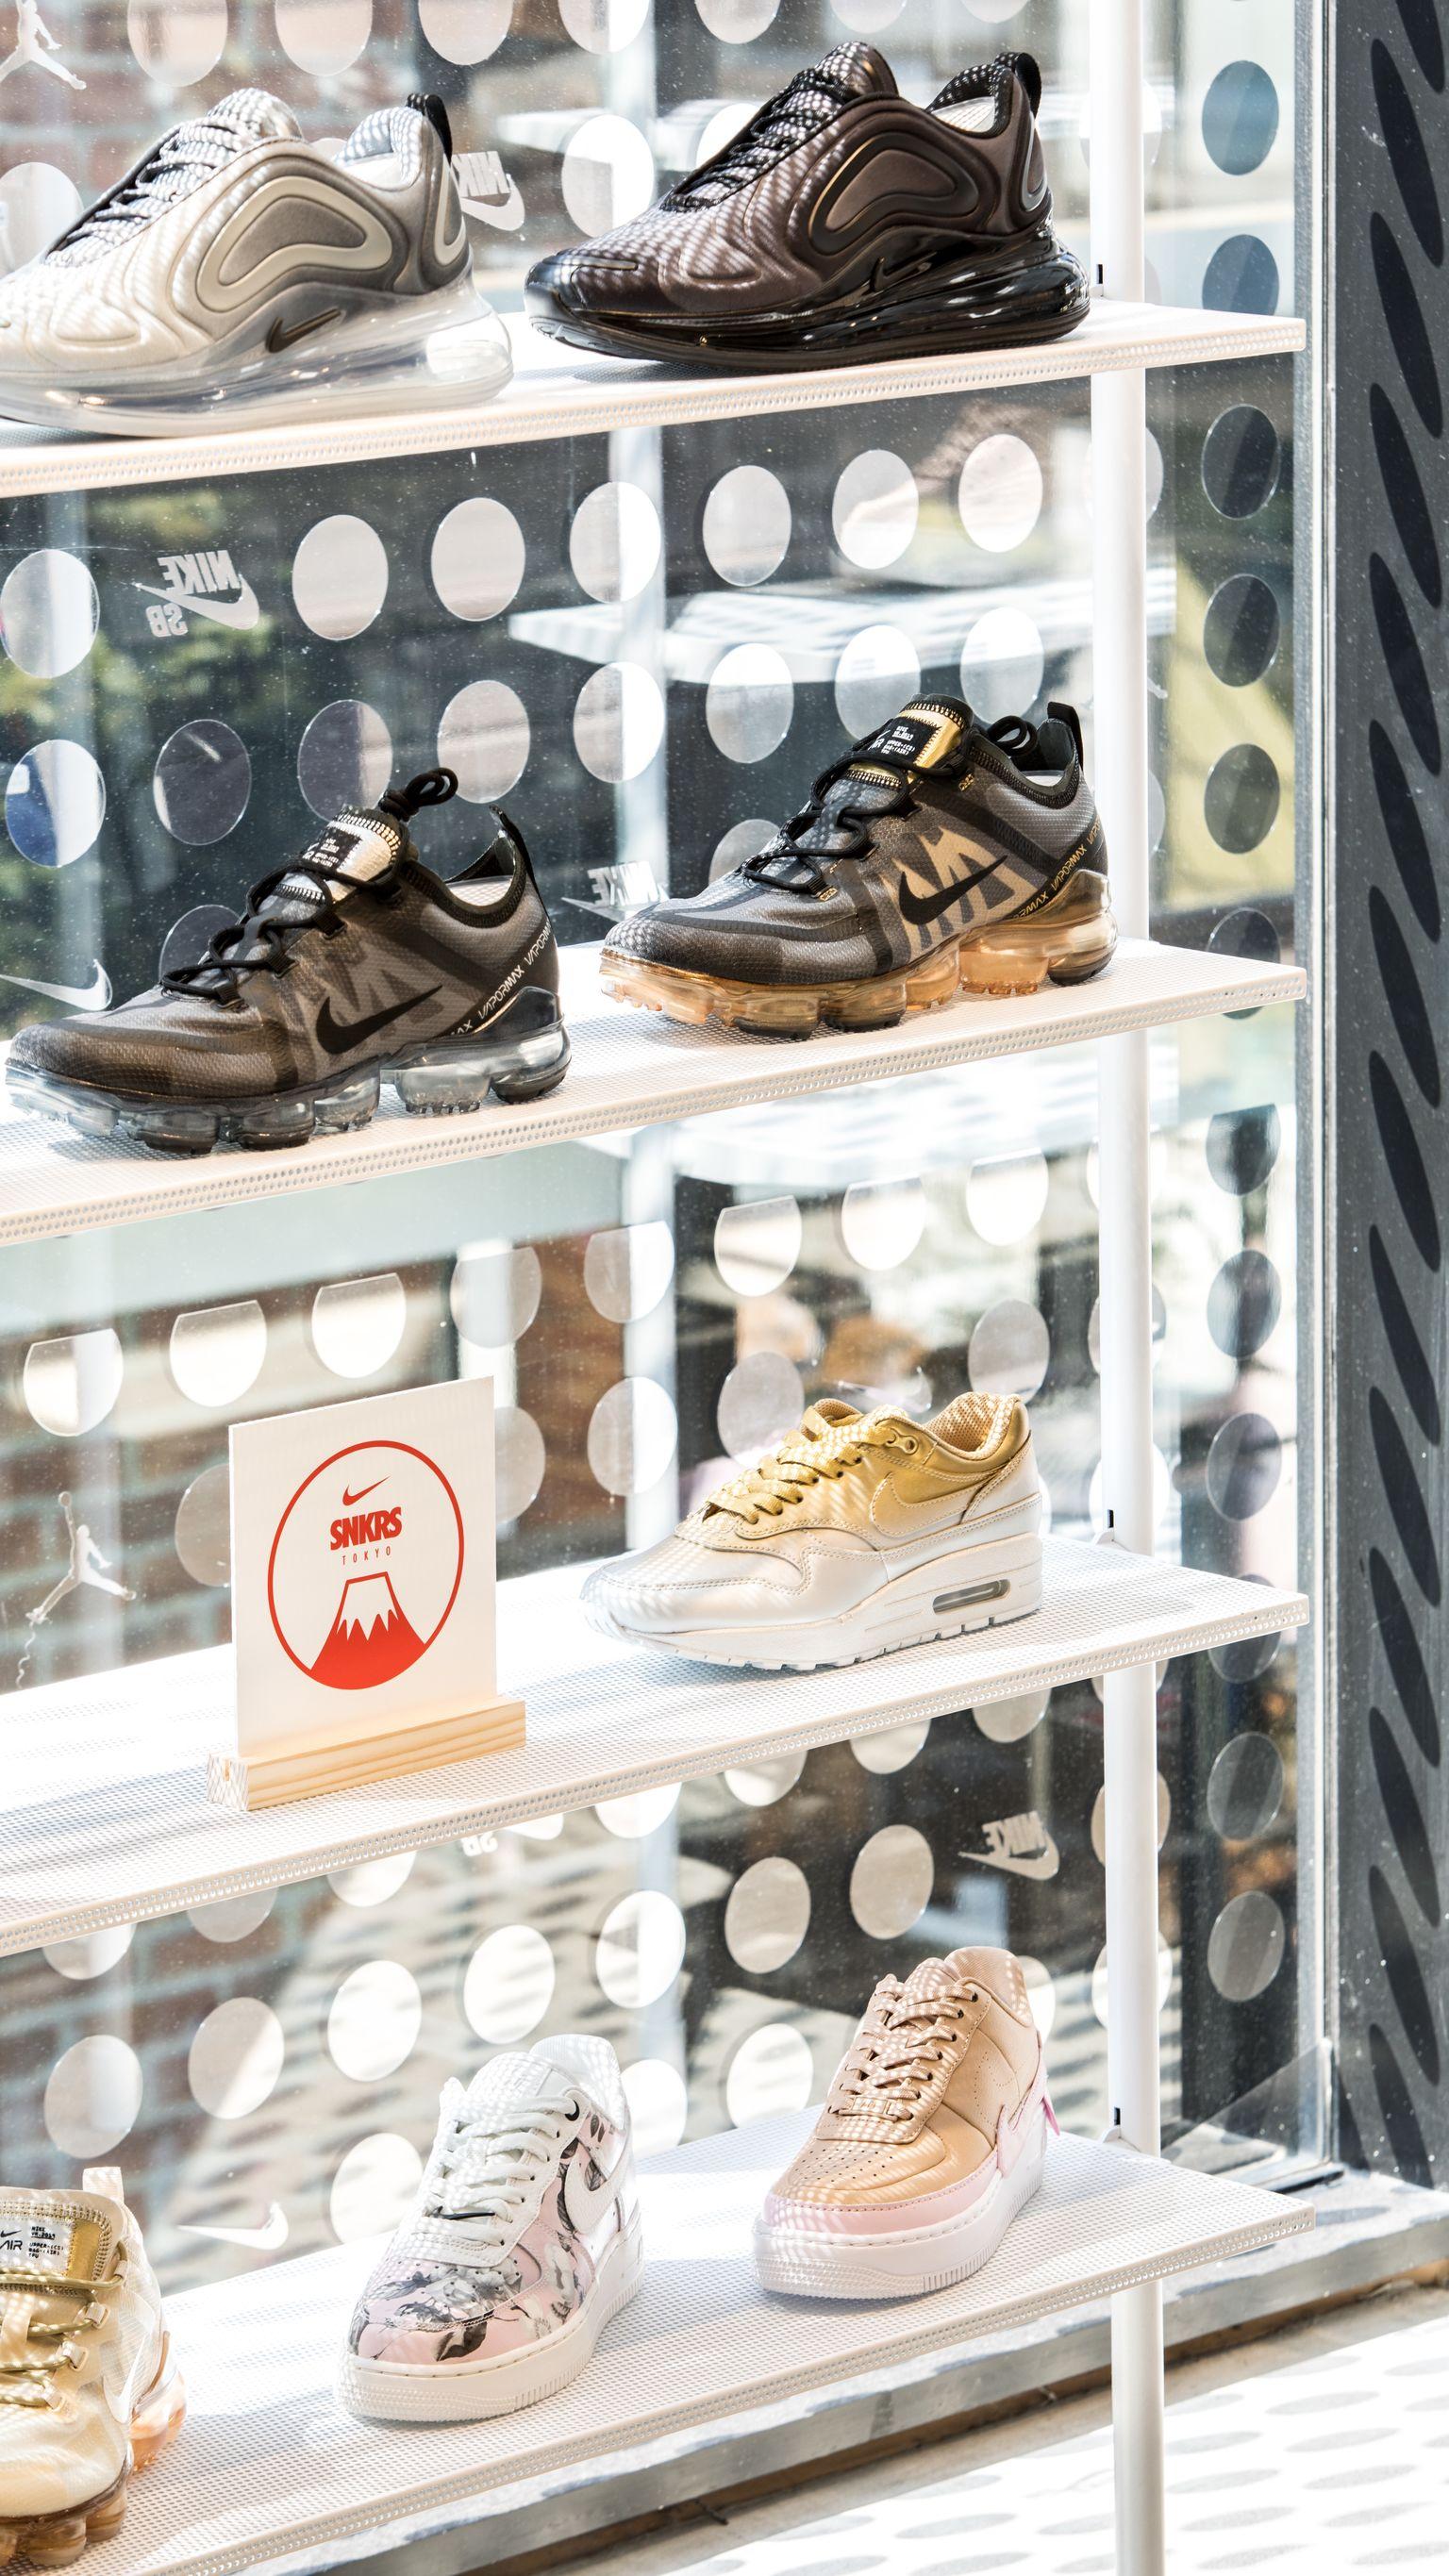 【NIKE公式】ONE YEAR OF SNKRS: Nike Kicks Lounge Omotesando